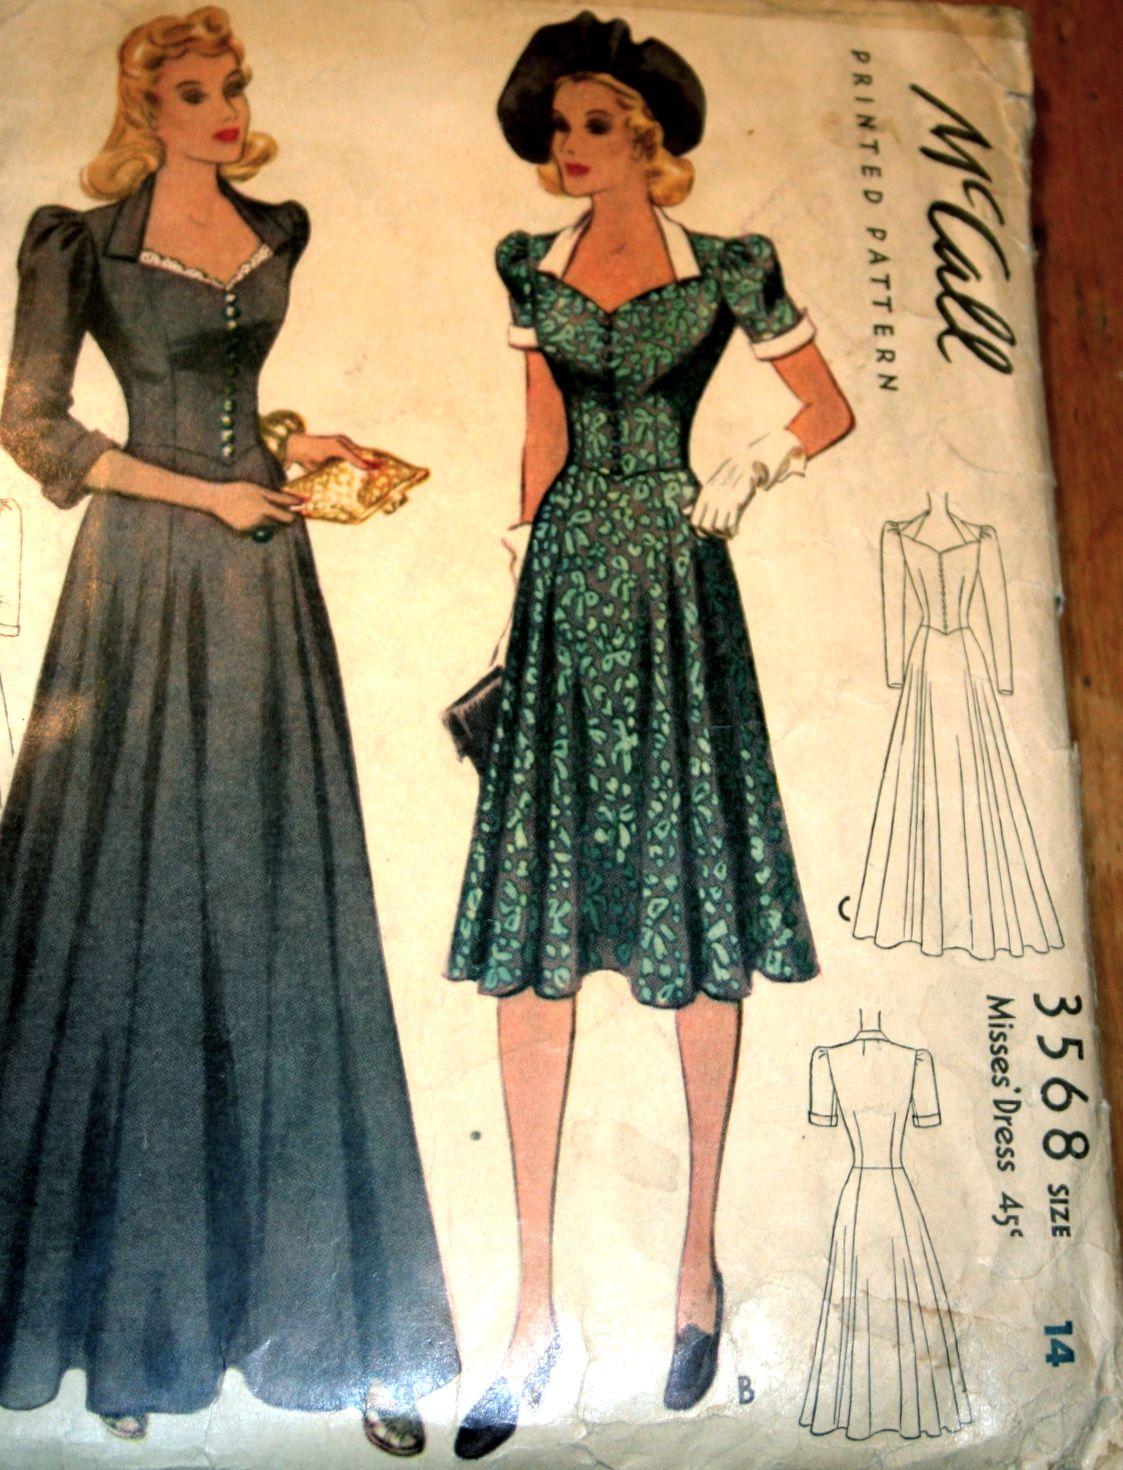 Mccall missesu dress outfit inspiration pinterest